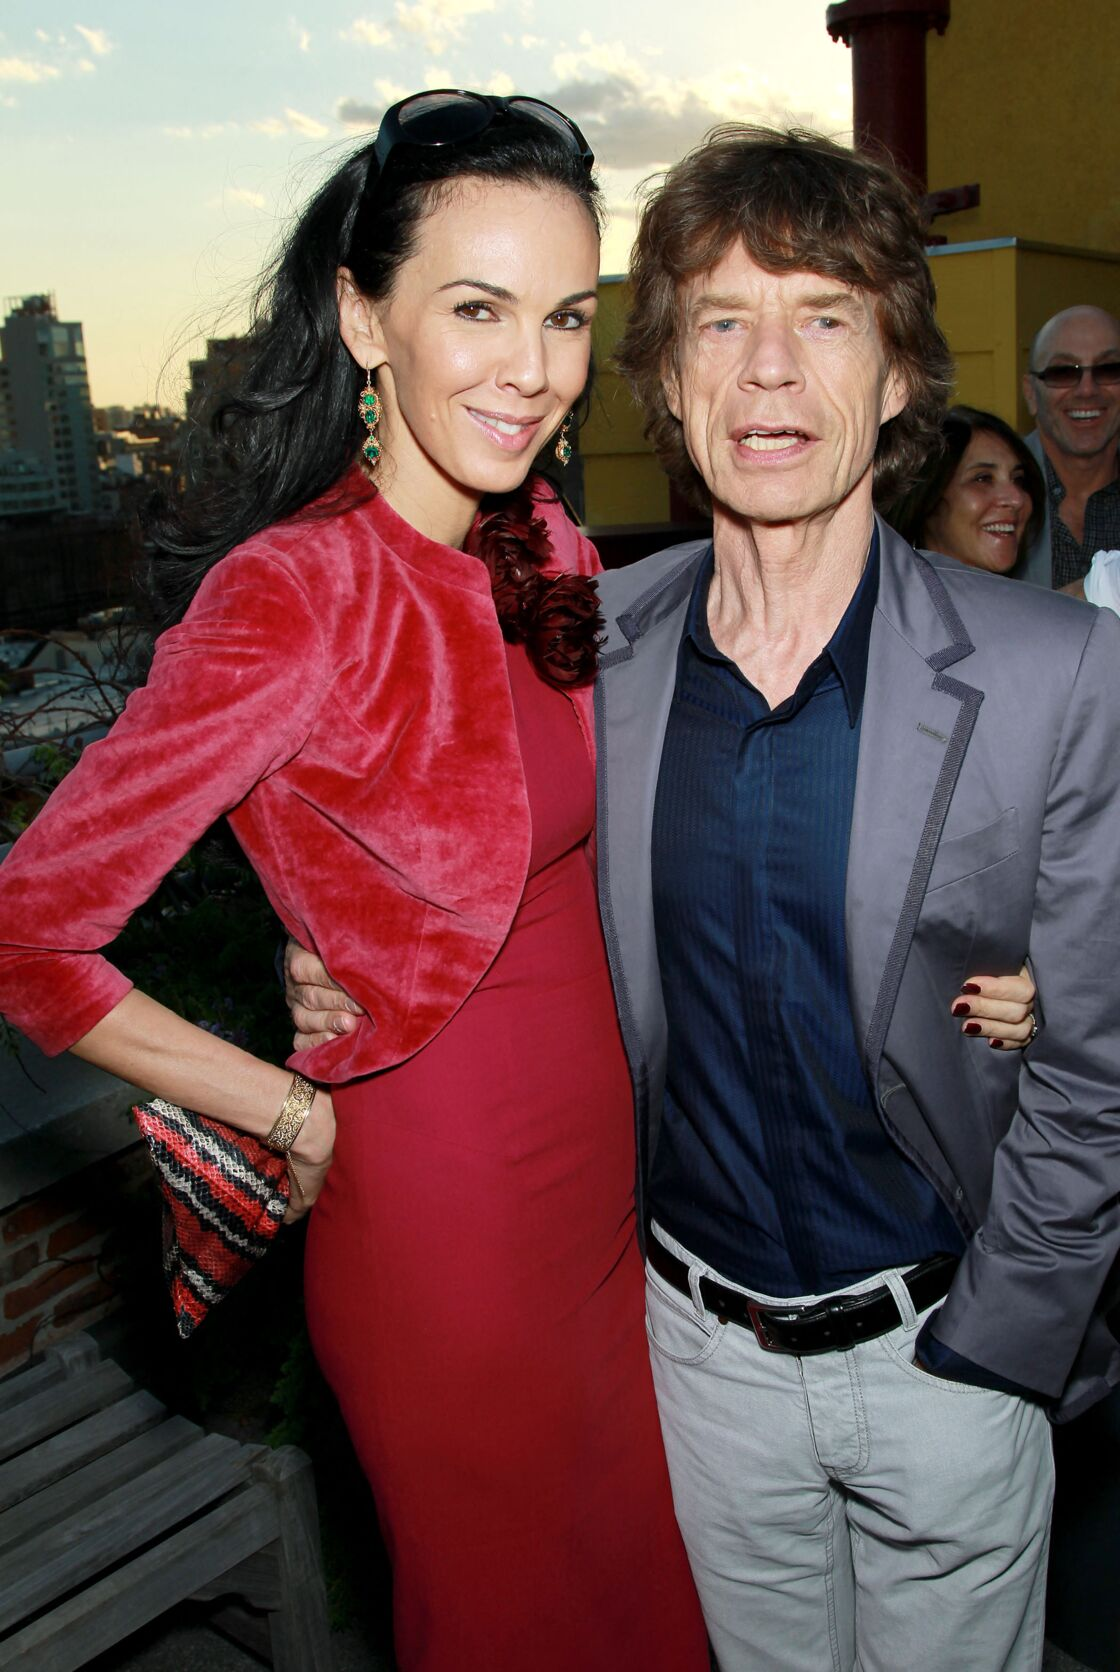 L'Wren Scott et Mick Jagger à New York, le 6 mai 2010